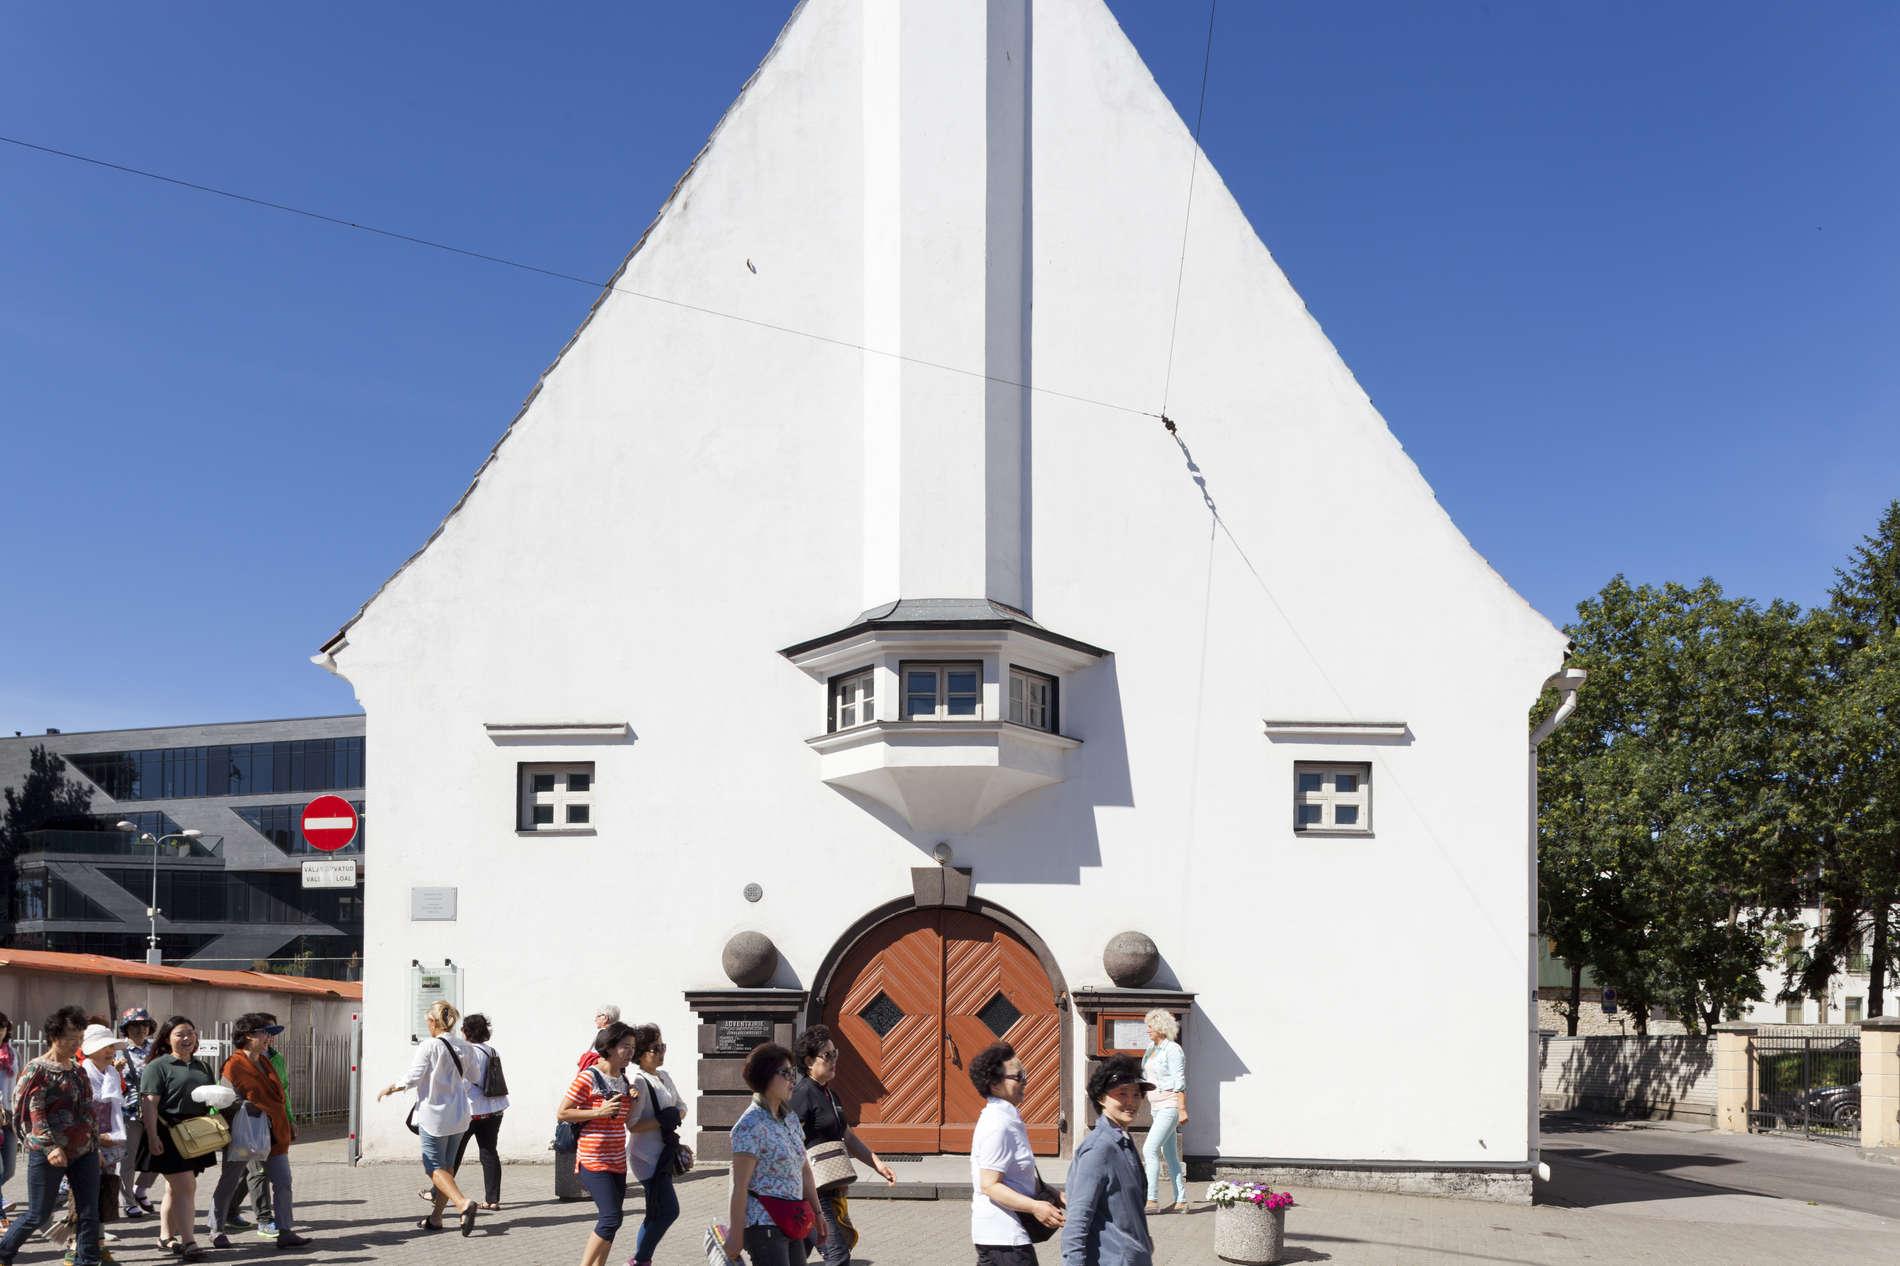 Adventist Church in Tallinn, Estonia